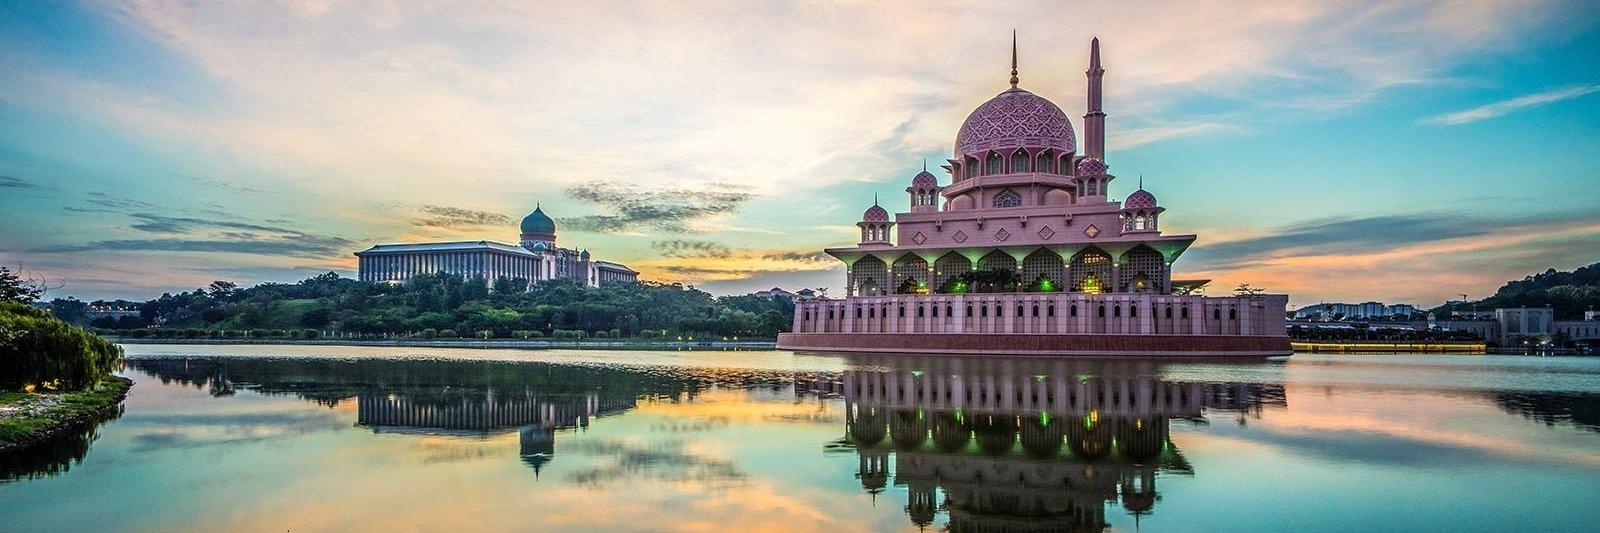 https://gody.vn/blog/yng20175152/post/cam-nang-du-lich-putrajaya-malaysia-cho-o-di-chuyen-tham-quan-5521